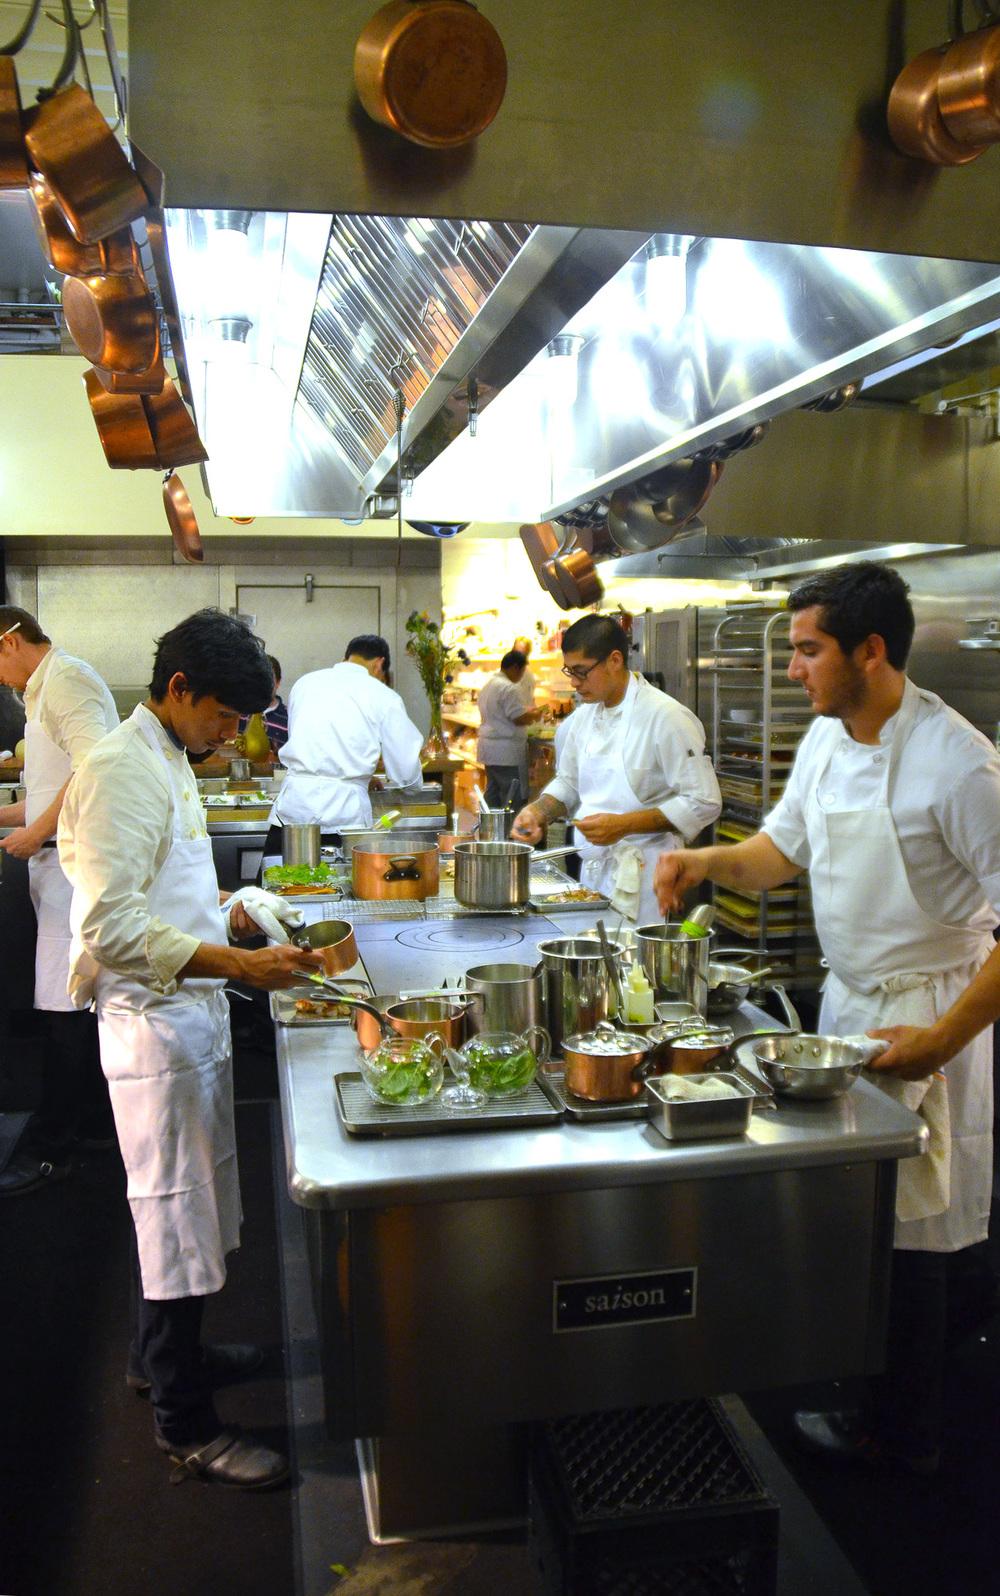 Saison-San-Francisco-Inside-the-Kitchen.jpeg